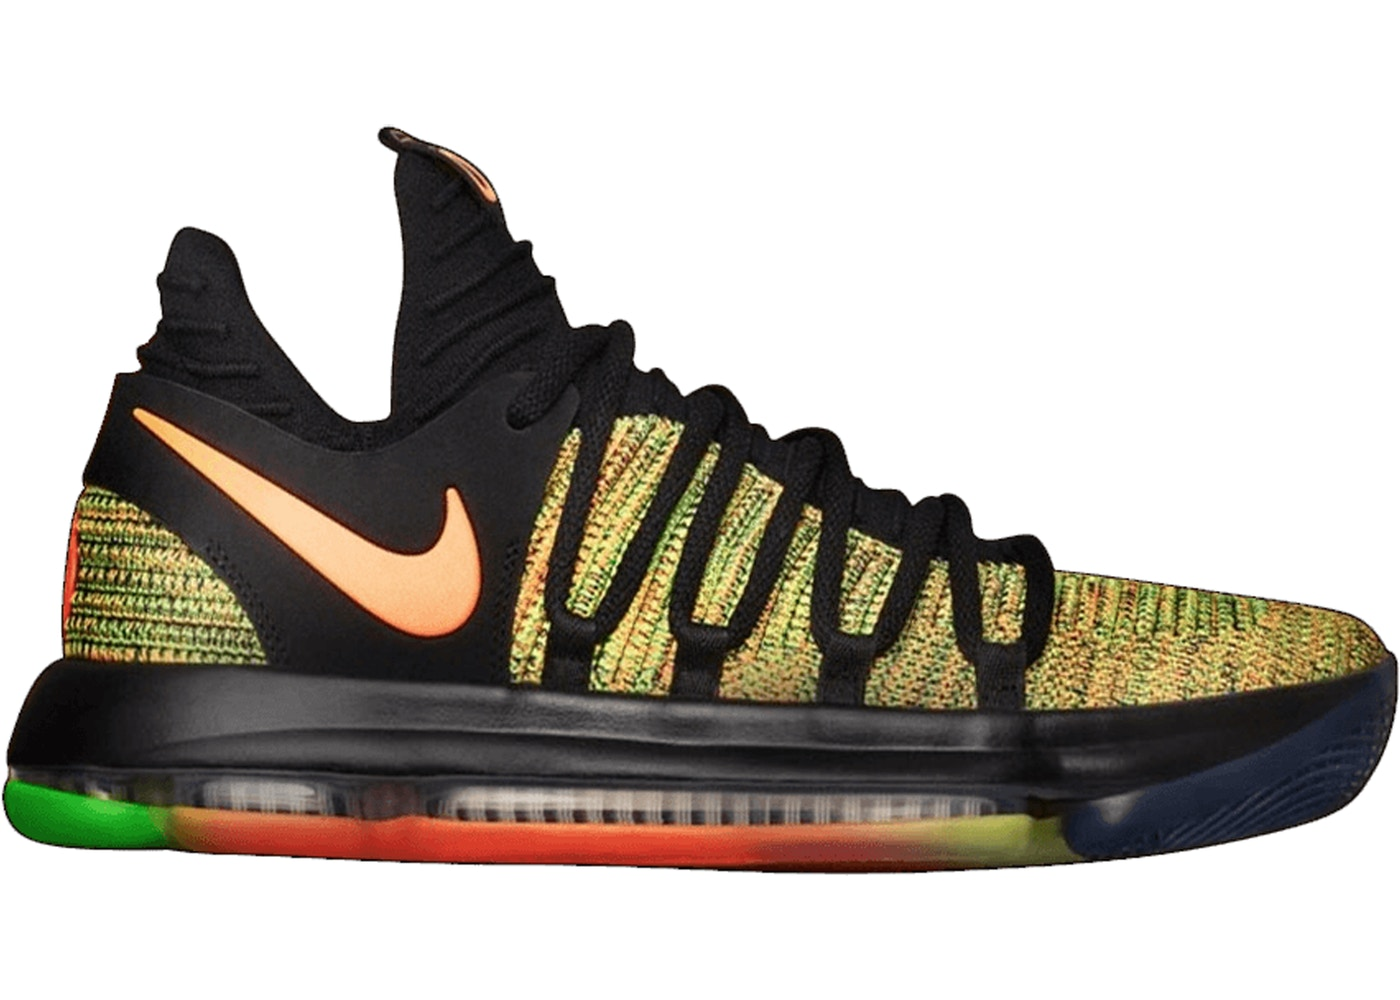 4ef1db544f3c Nike KD Shoes - Average Sale Price